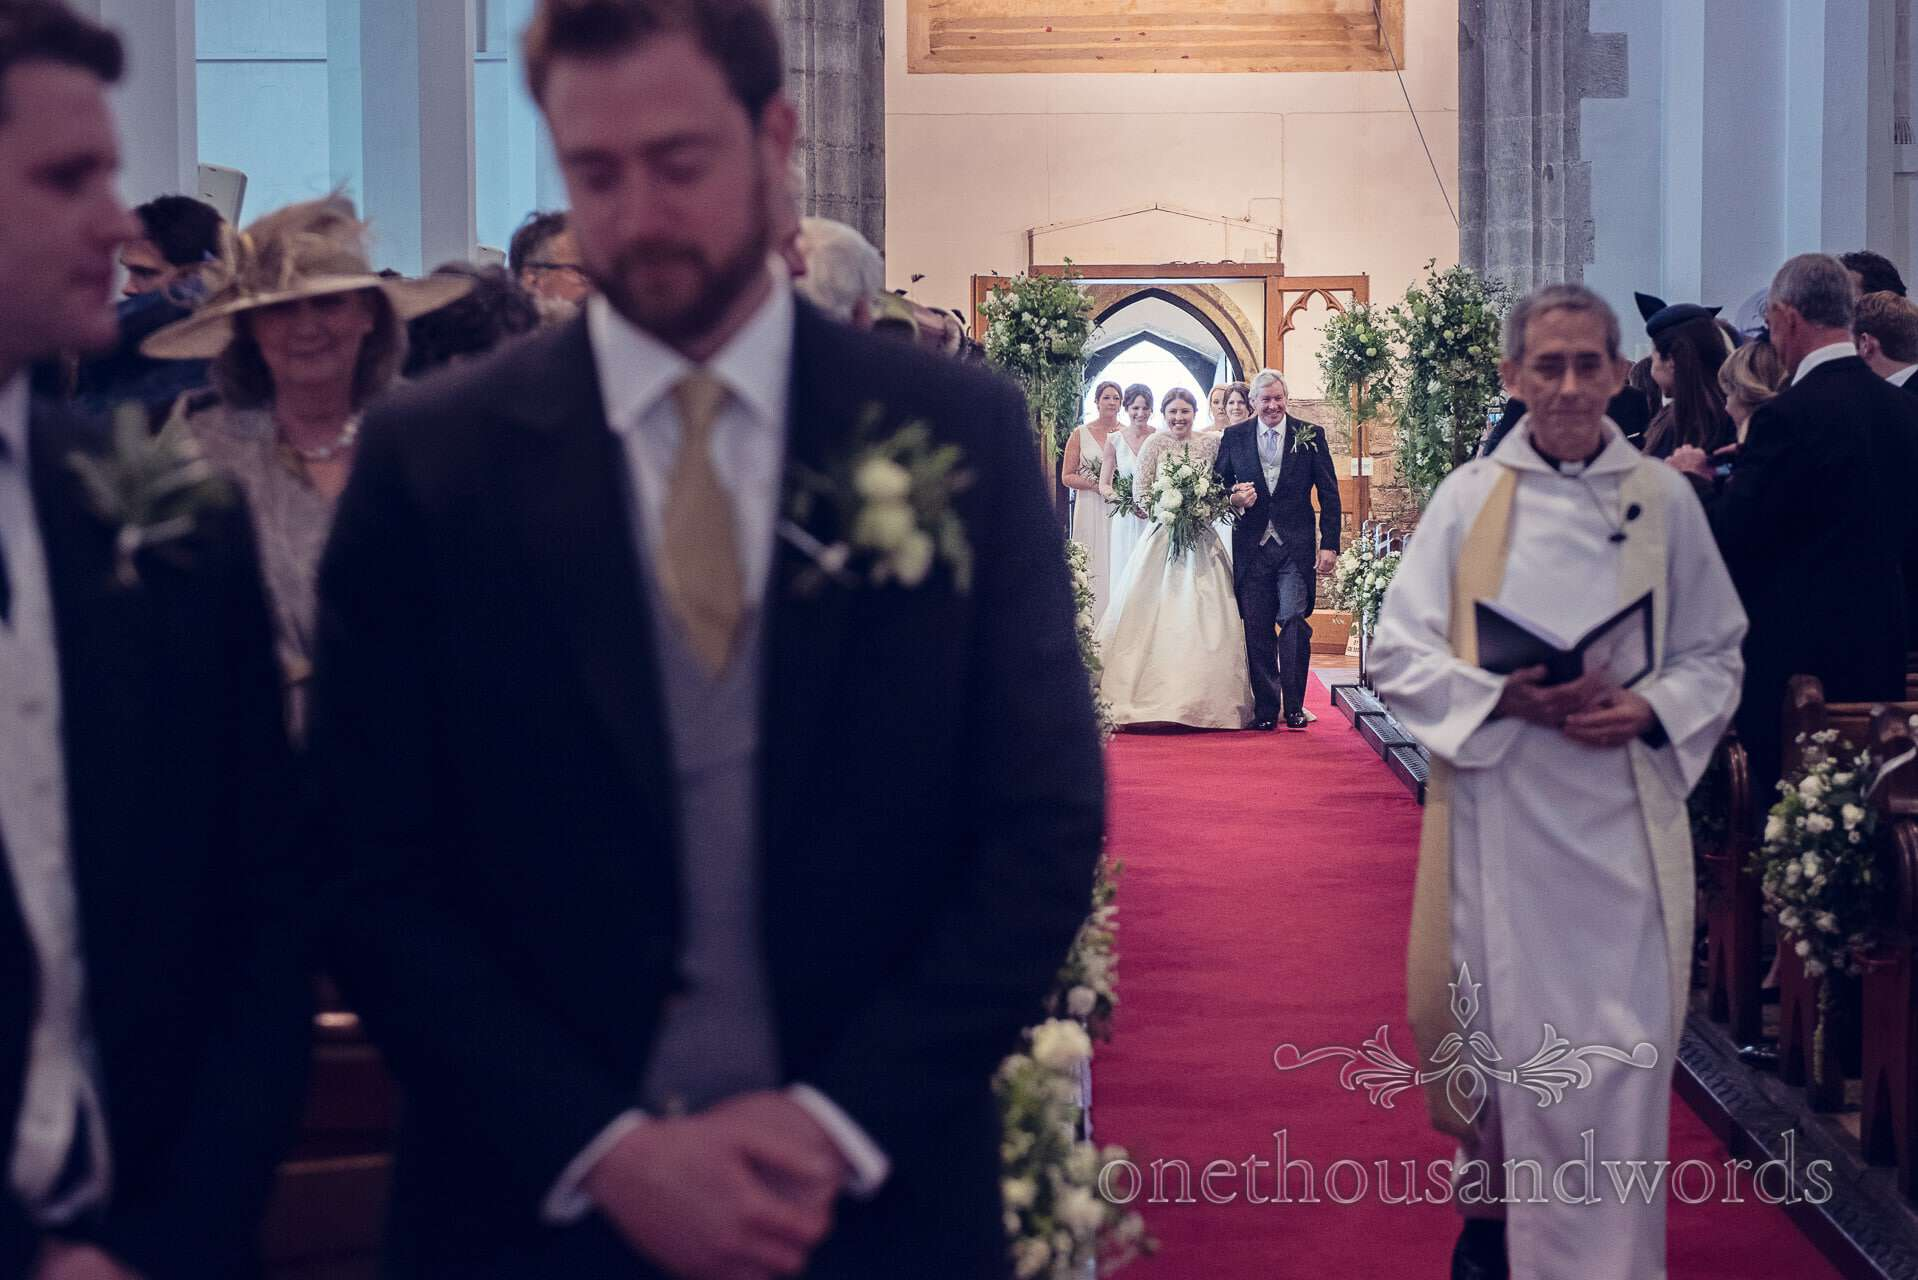 Bride walks down the aisle at St Mary's Church Wareham wedding